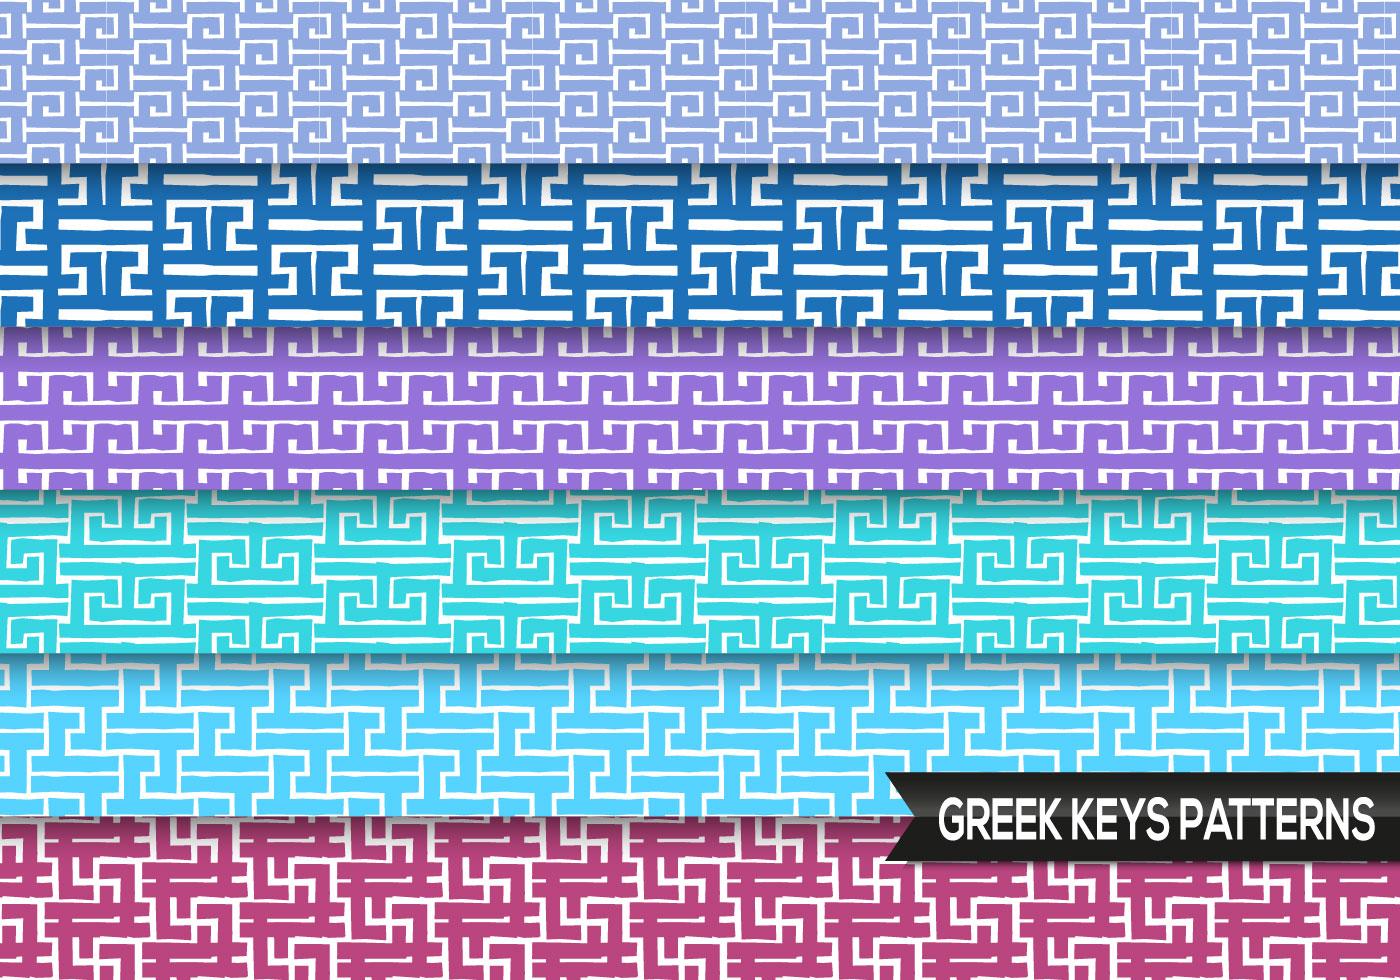 Greek Keys Patterns Vector - Download Free Vector Art ...